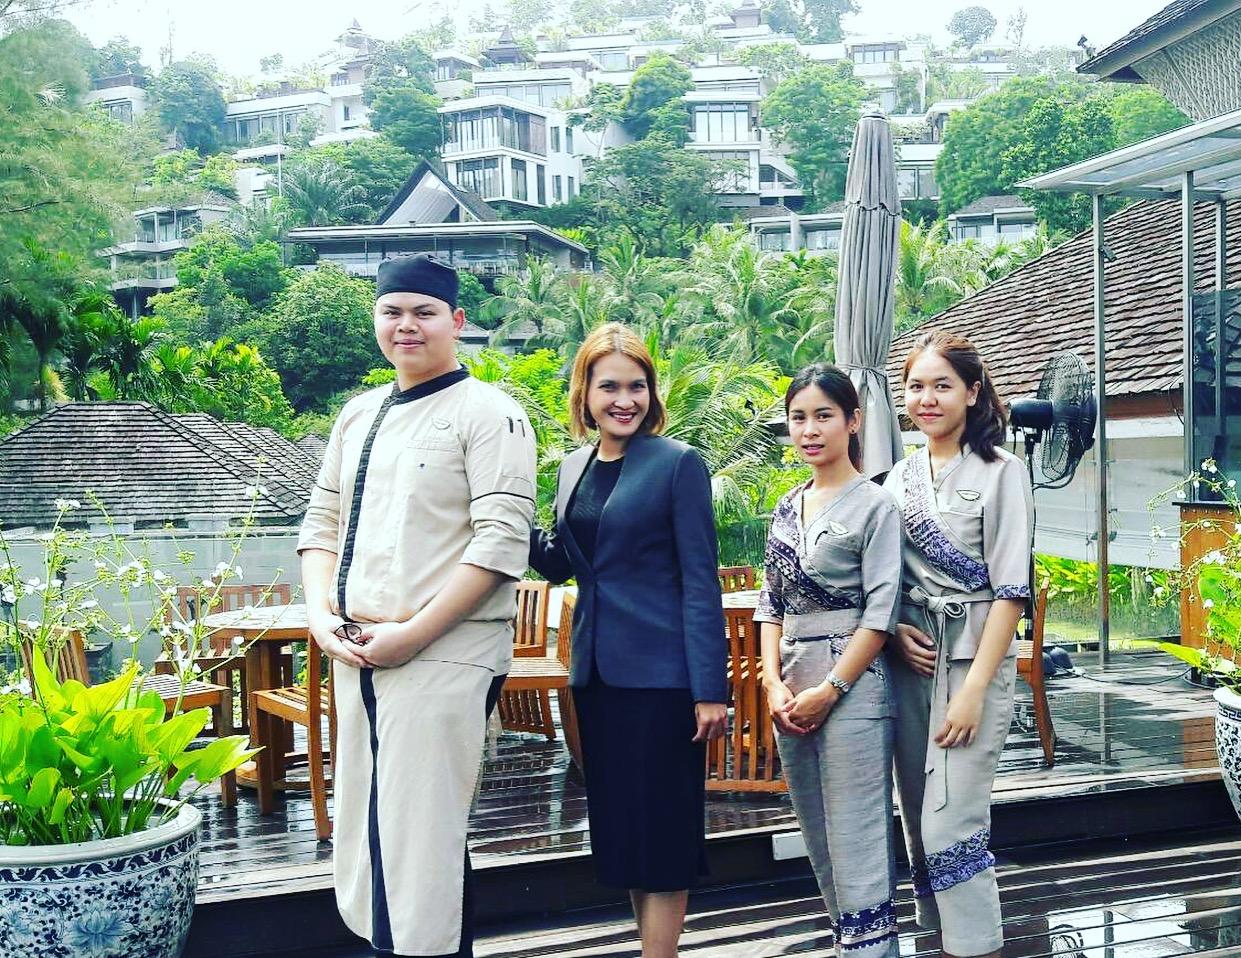 ….    Academic Affairs Co-ordinator Koya Prayoonchat with I-TIM students Claw, Oh, and Cream during their internship at the Anantara Layan in Phuket.    ..    ผู้ประสานงาน ฝ่ายงานวิชาการ คุณกอหญ้า ประยูรชาติ กับนักเรียนไอทิม ข้าว โอ้ และครีม ระหว่างการฝึกงานที่อนันตรา ลายัน จังหวัดภูเก็ต    ….